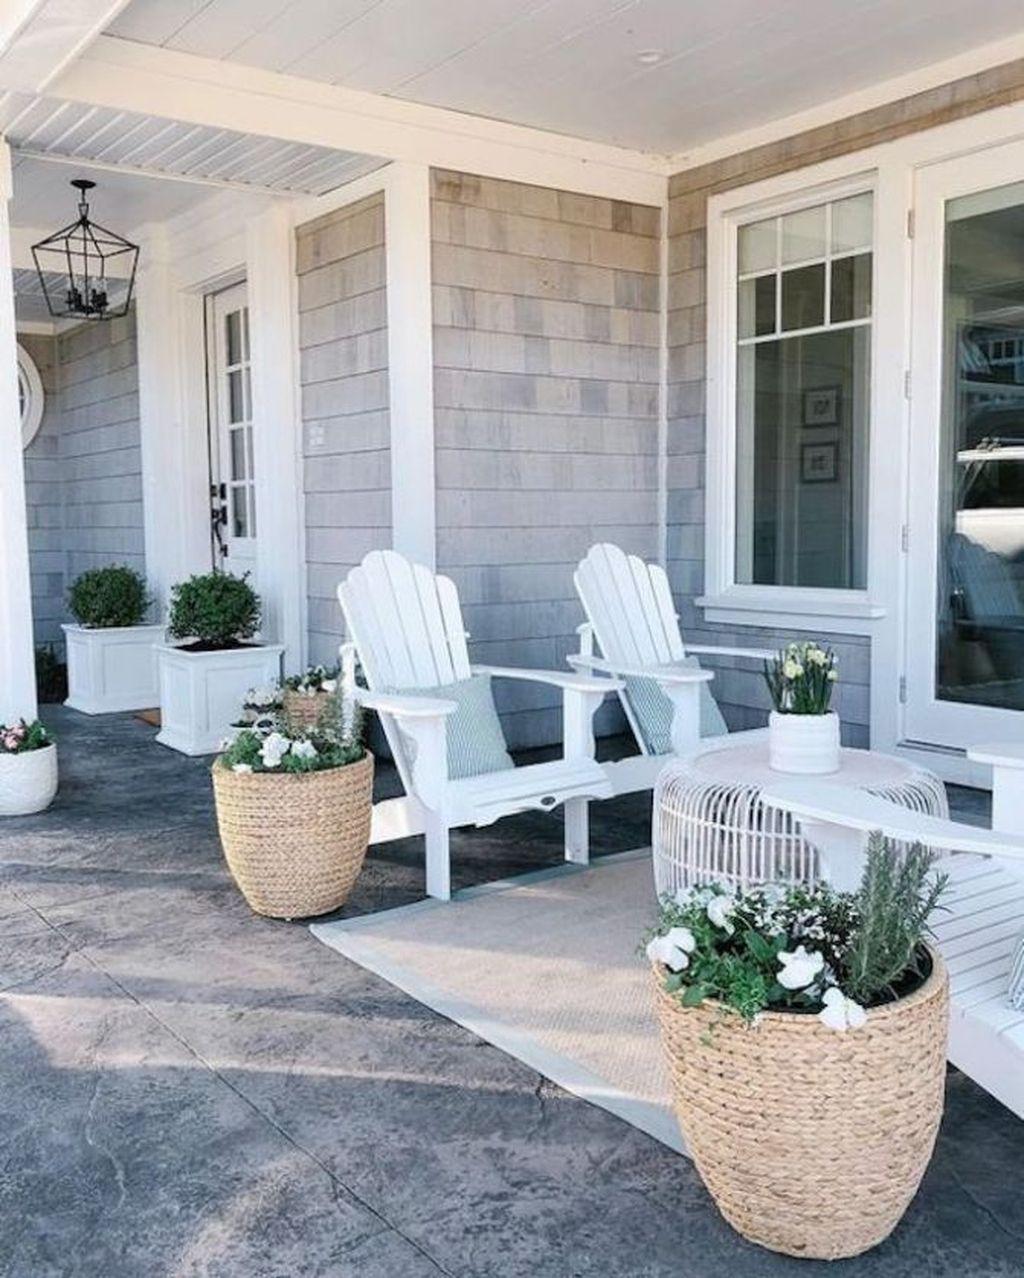 Inspiring Spring Planters Design Ideas For Front Door 10